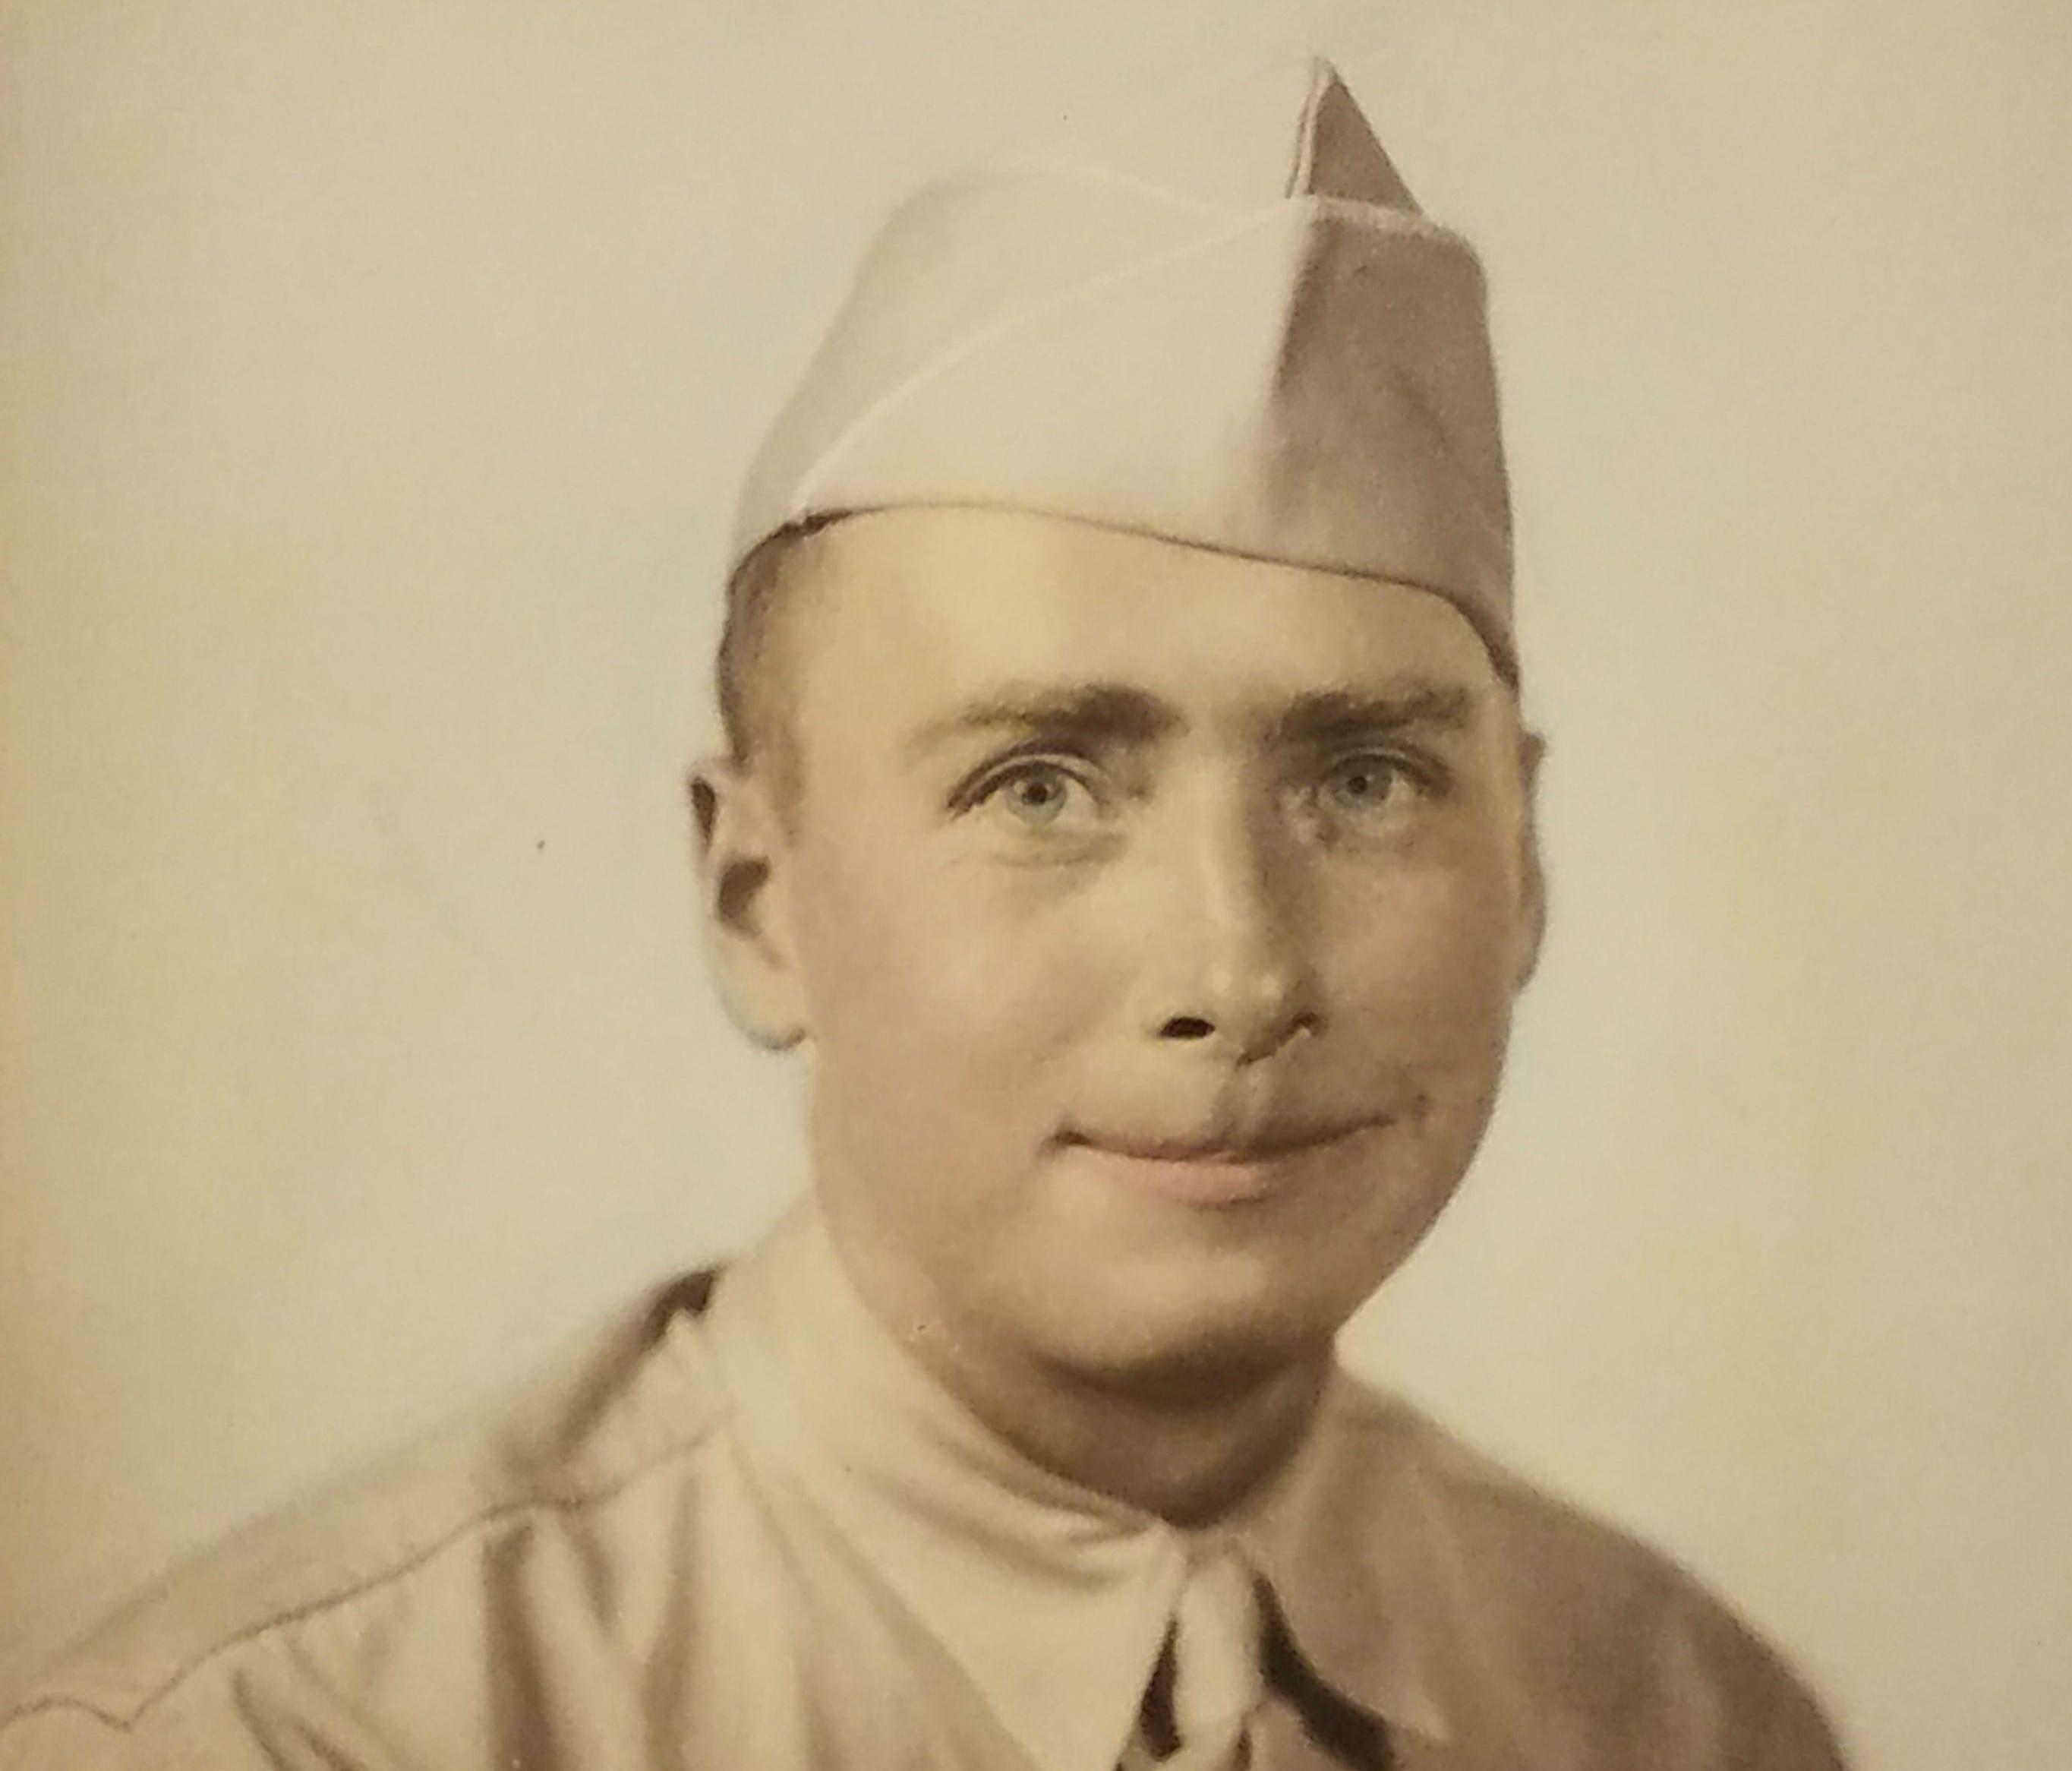 A photo of Bernard McNamara, whose Purple Heart was found in Rockland County.